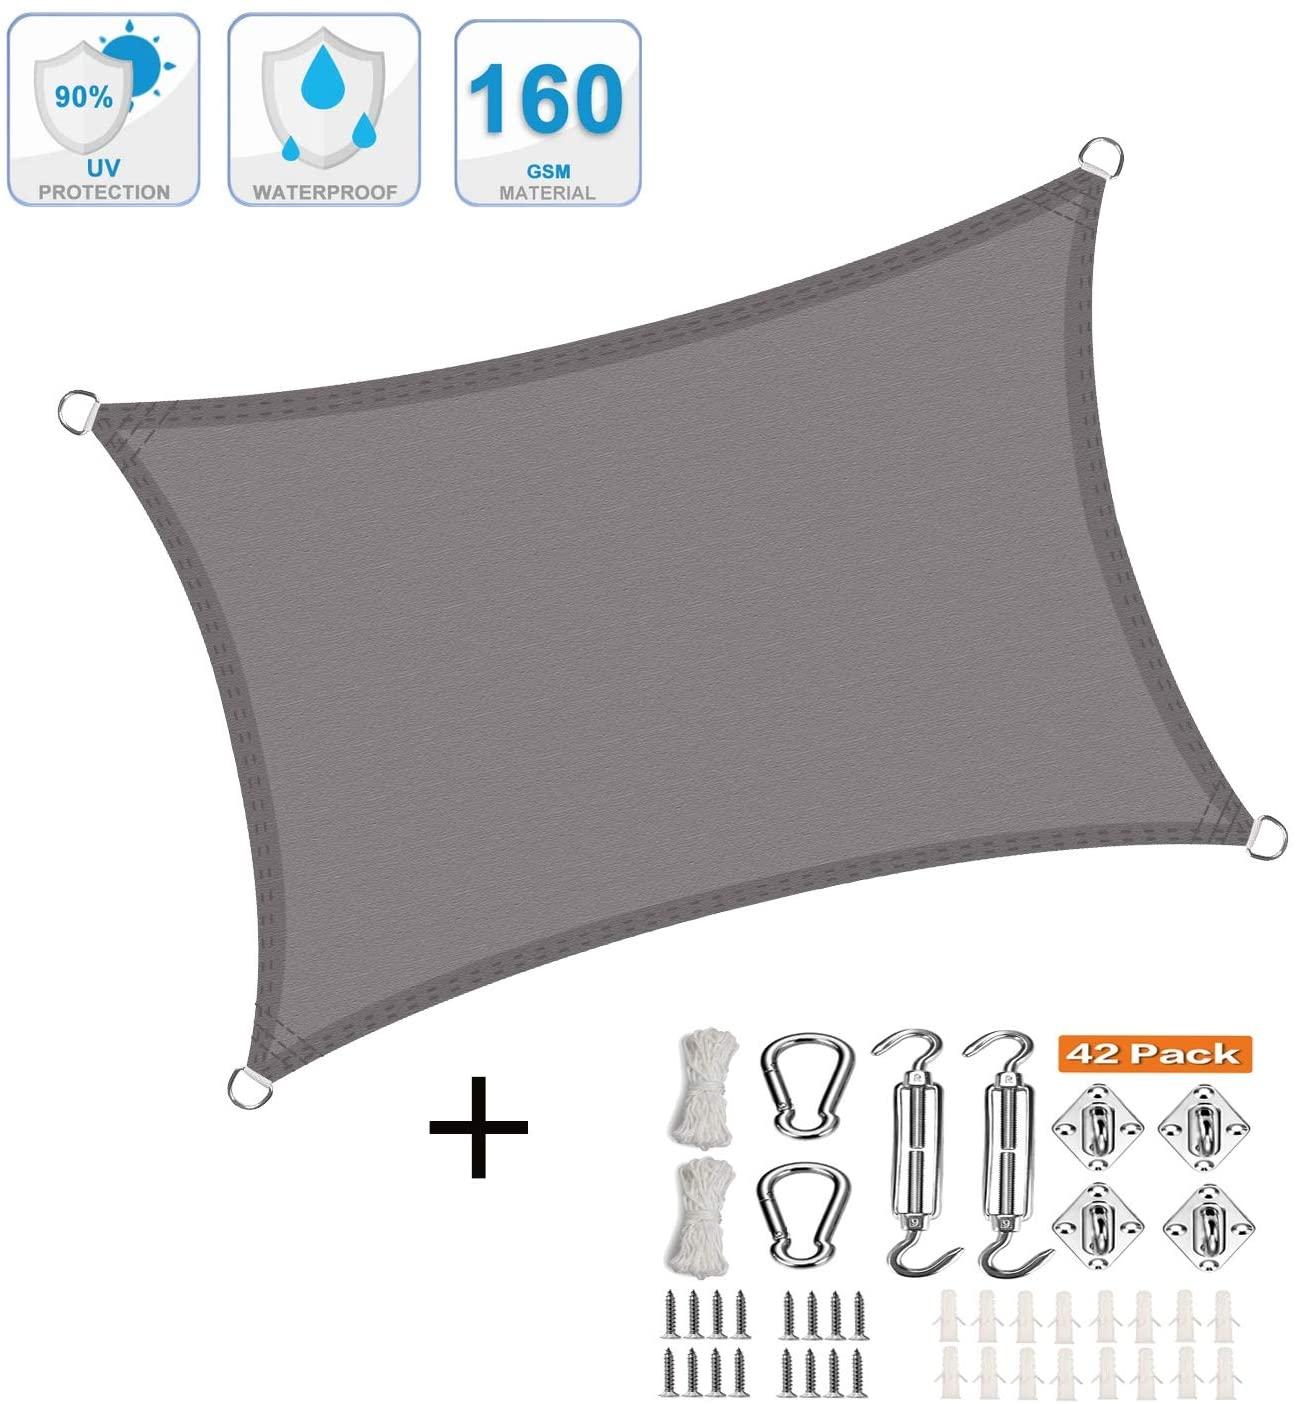 XXJF Sun Shade 95uvBlockageWaterairPermeable,DurableRopesIncluded Shade Sail Rectangle PESPolyesterSunshadeFabricDurable PerfectforOutdoorPatioGardenYard (Color : Gray, Size : 2x4.5m)